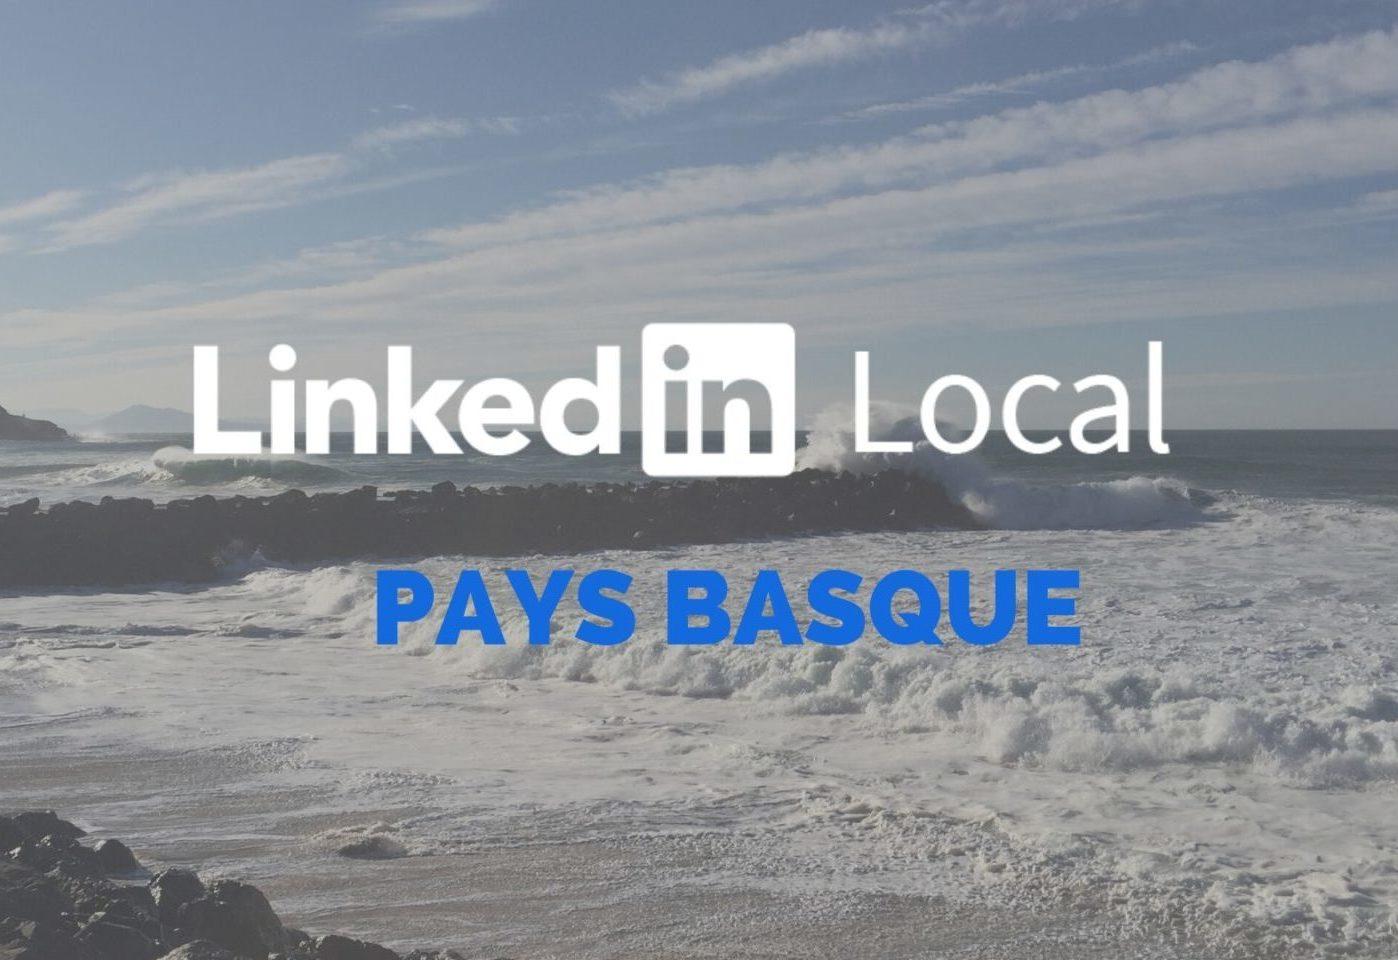 LinkedIn Local Pays Basque